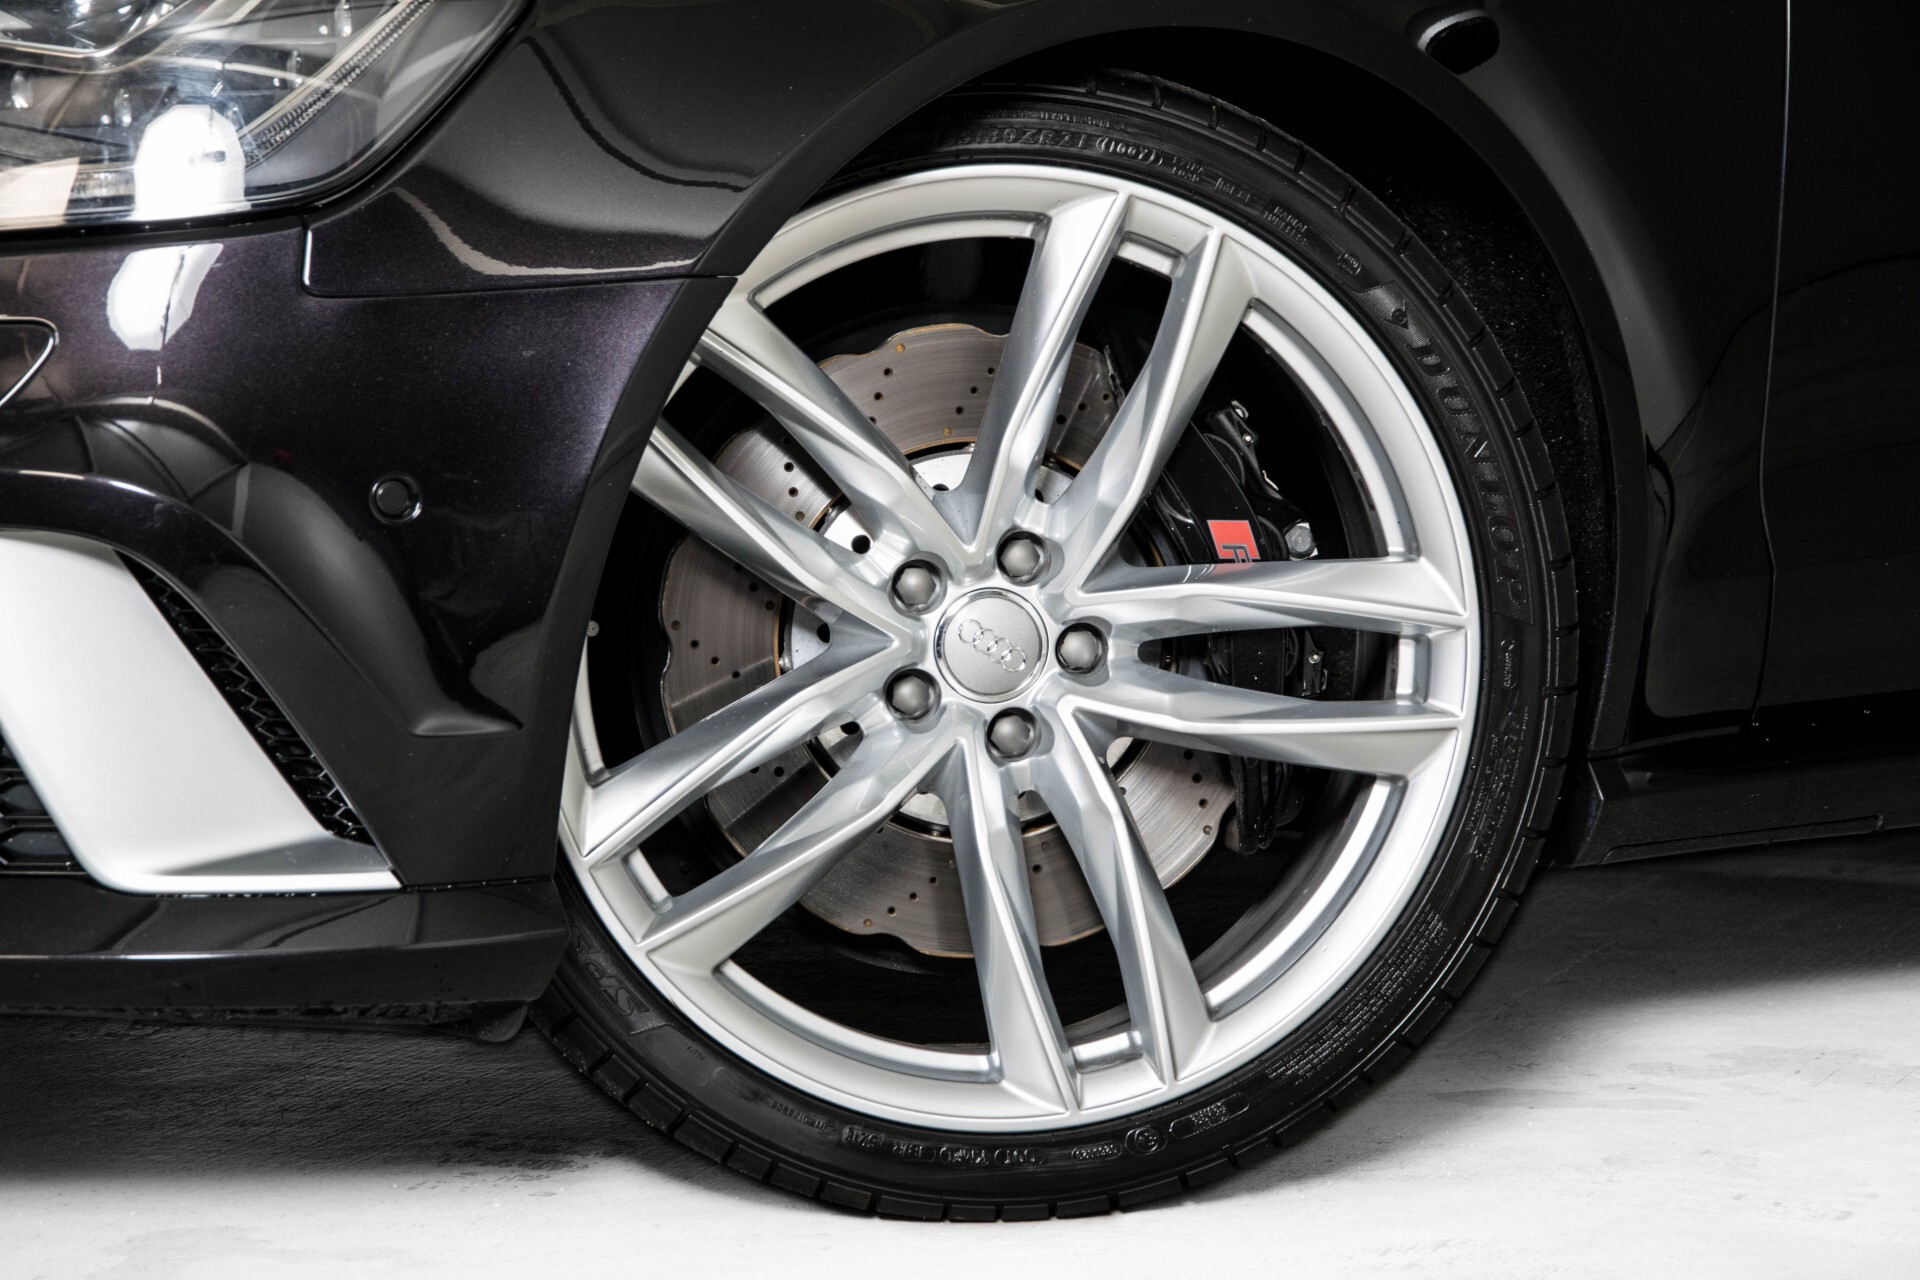 Audi RS6 Avant 4.0 TFSI Quattro B&O/Carbon/Head-Up/Nachtzicht/Exclusive/Camera/Keyless/Pano Aut8 Foto 42